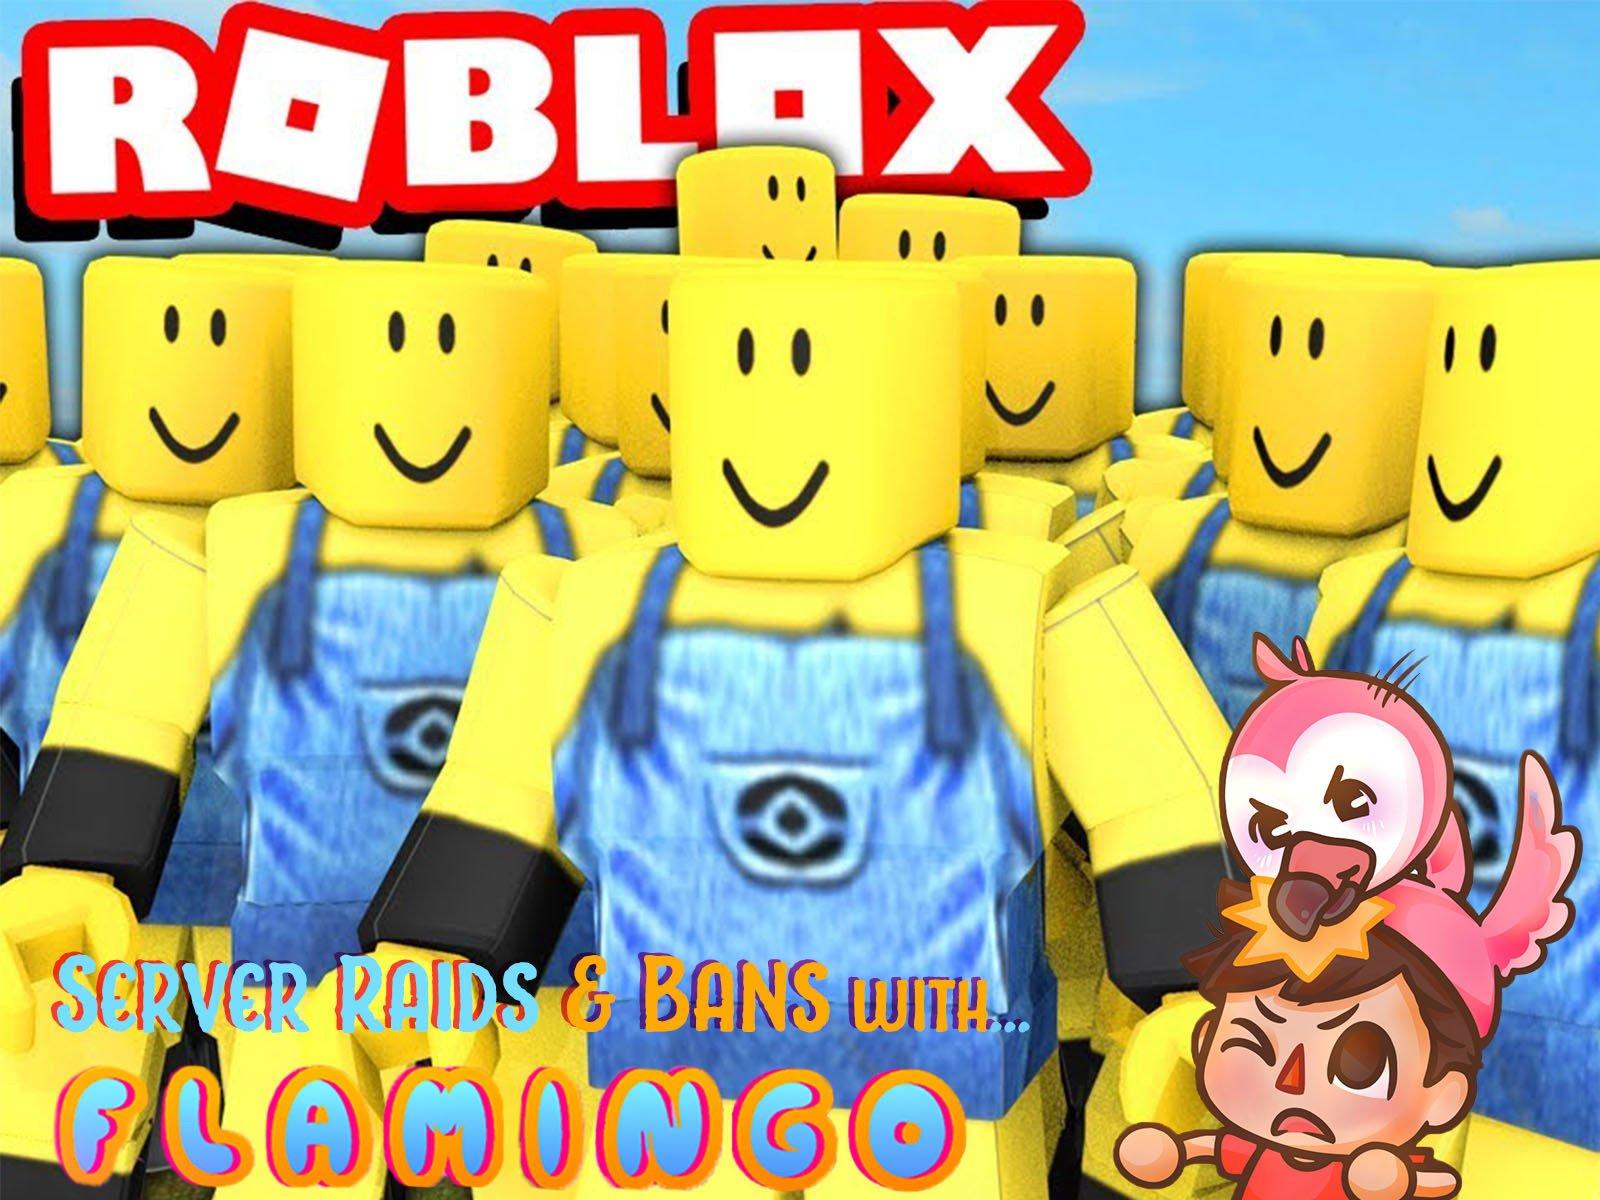 Roblox Server Raids & Bans with Flamingo on Amazon Prime Video UK